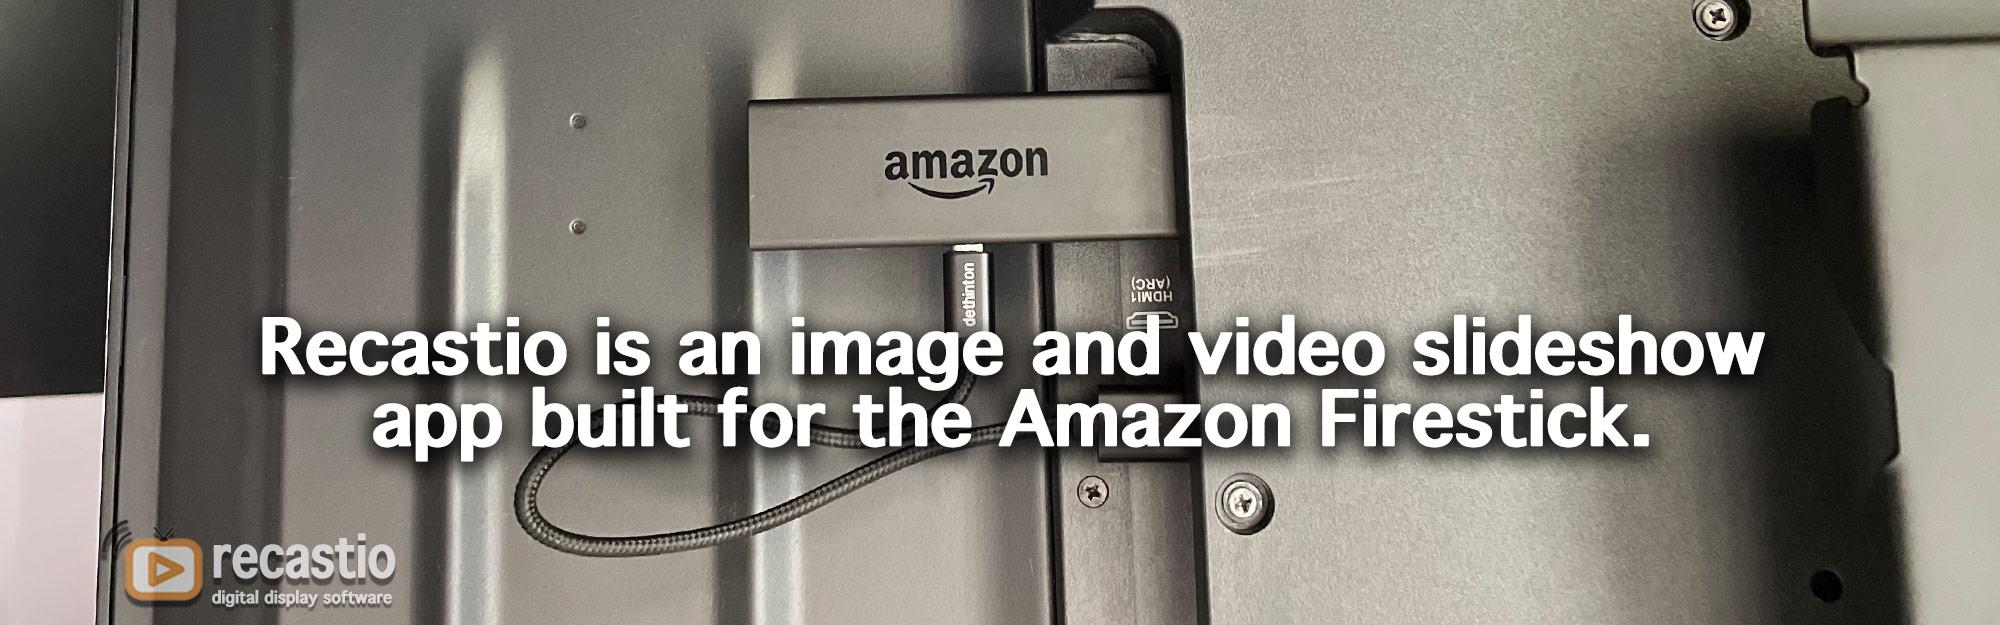 image and video slideshow using flatescreens